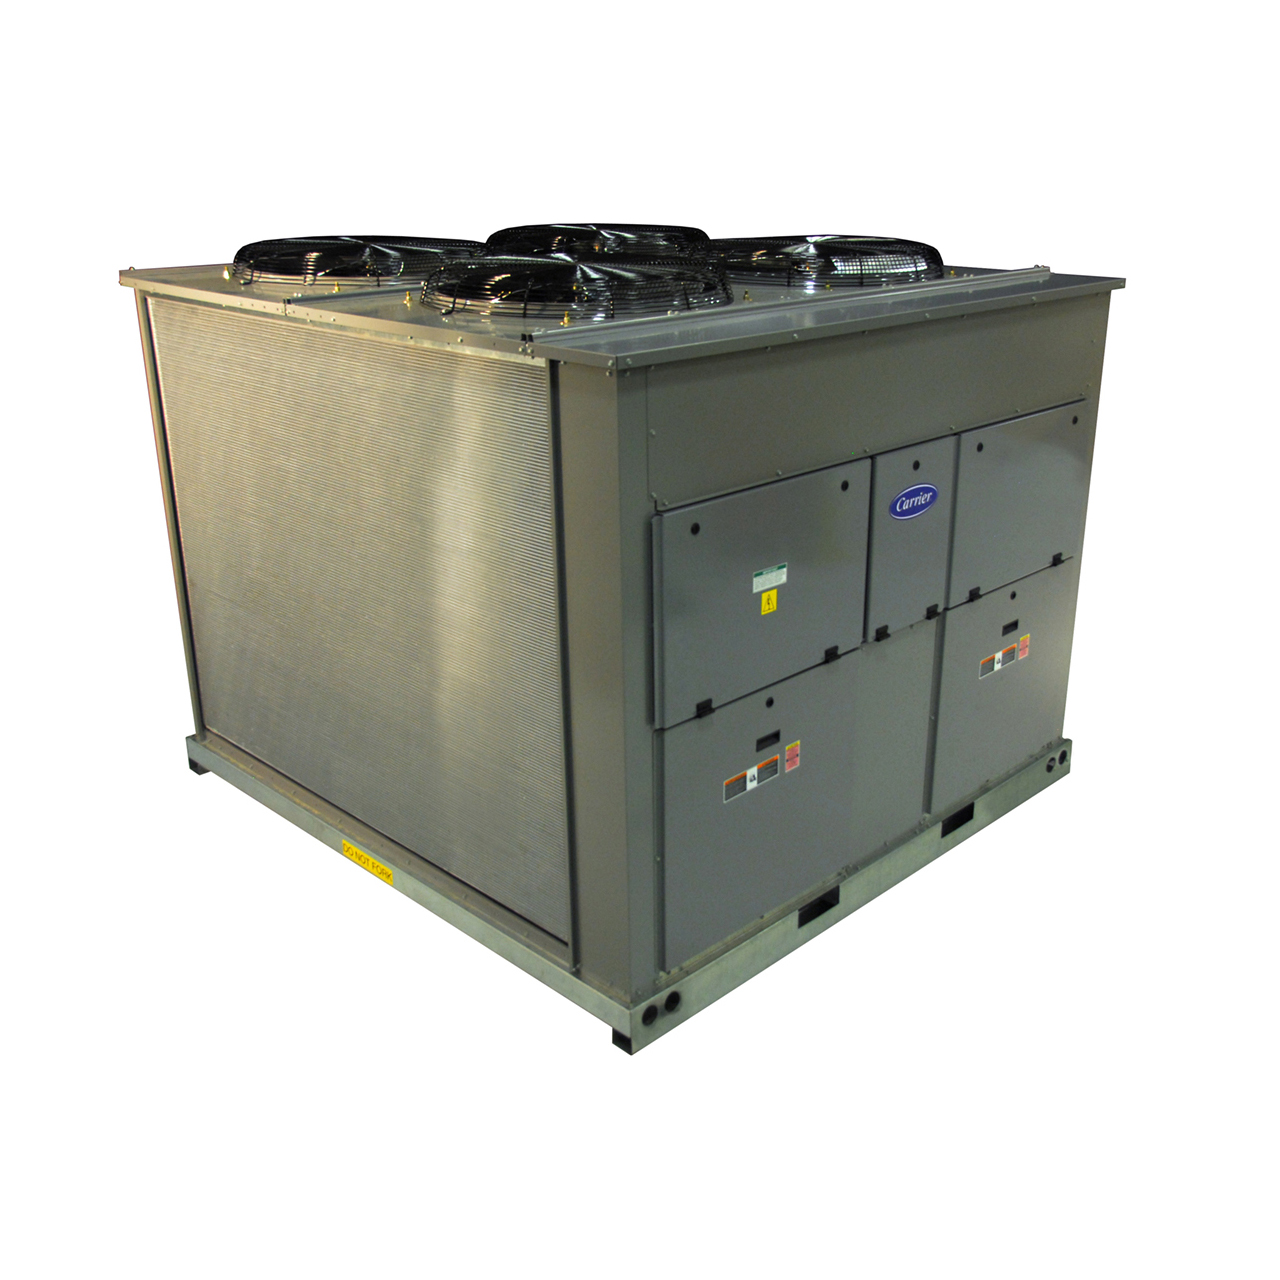 carrier-38ap070-condensing-unit